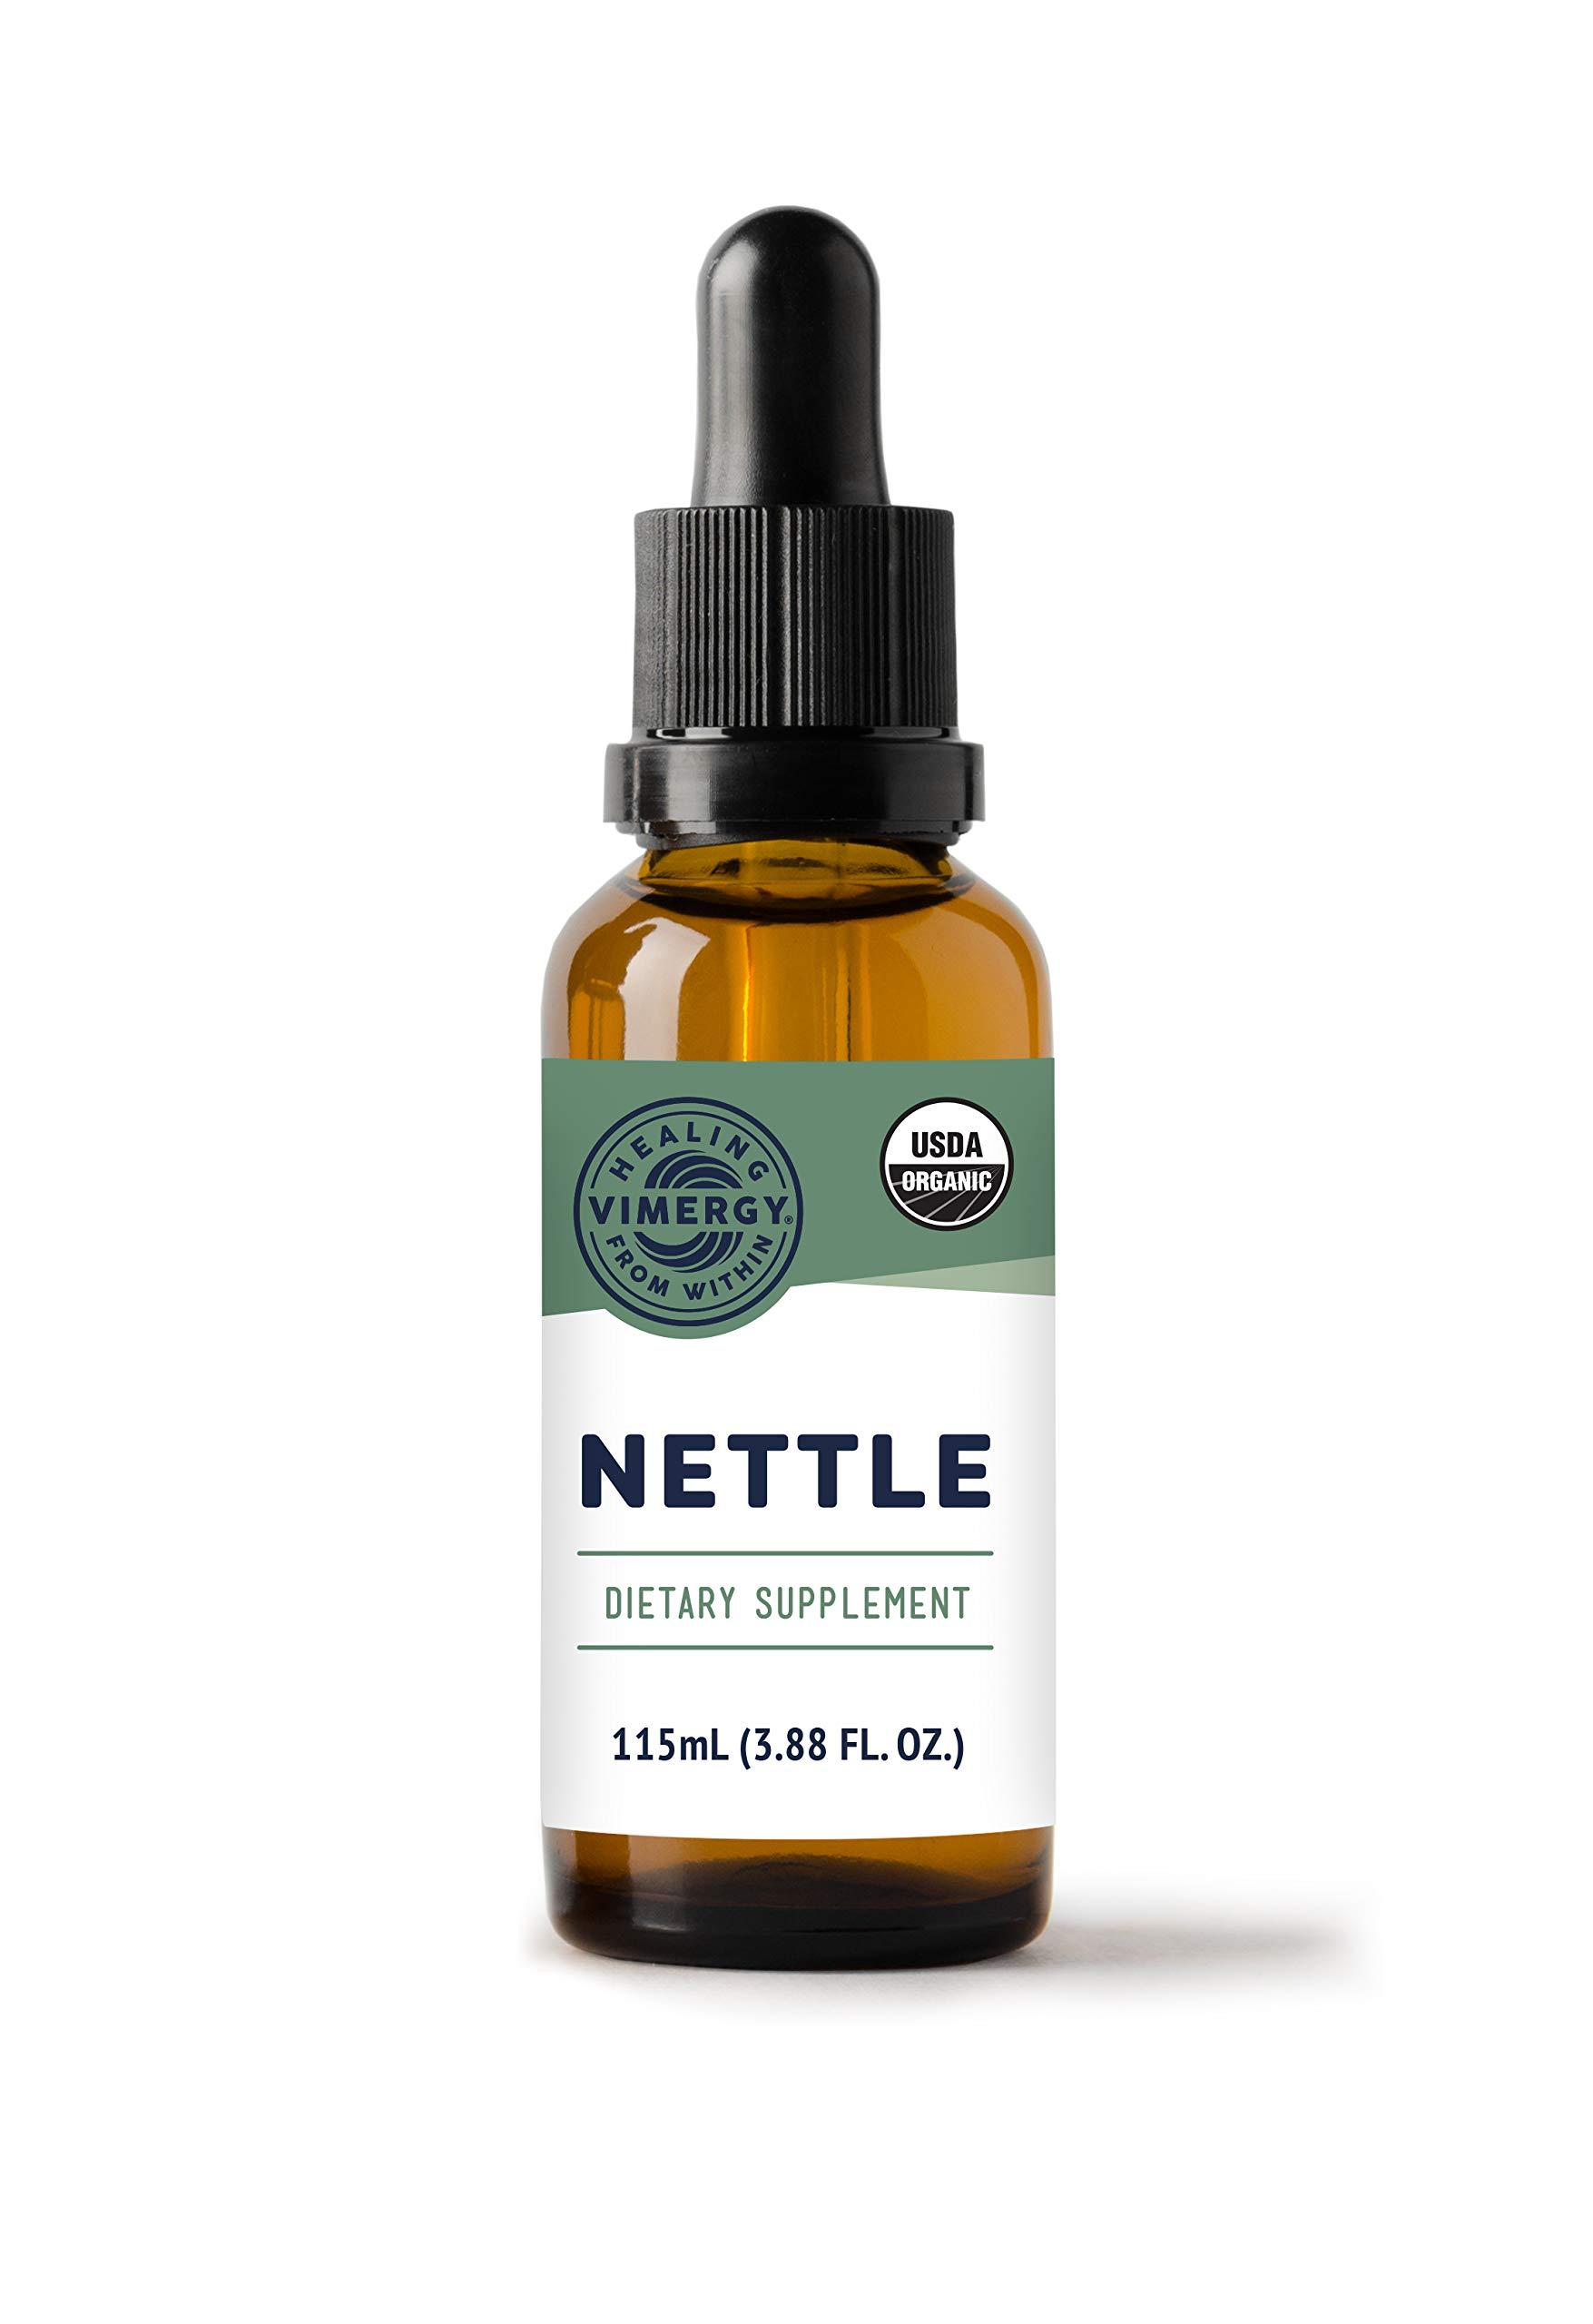 Vimergy USDA Organic Nettle Leaf 10:1 (115 ml)